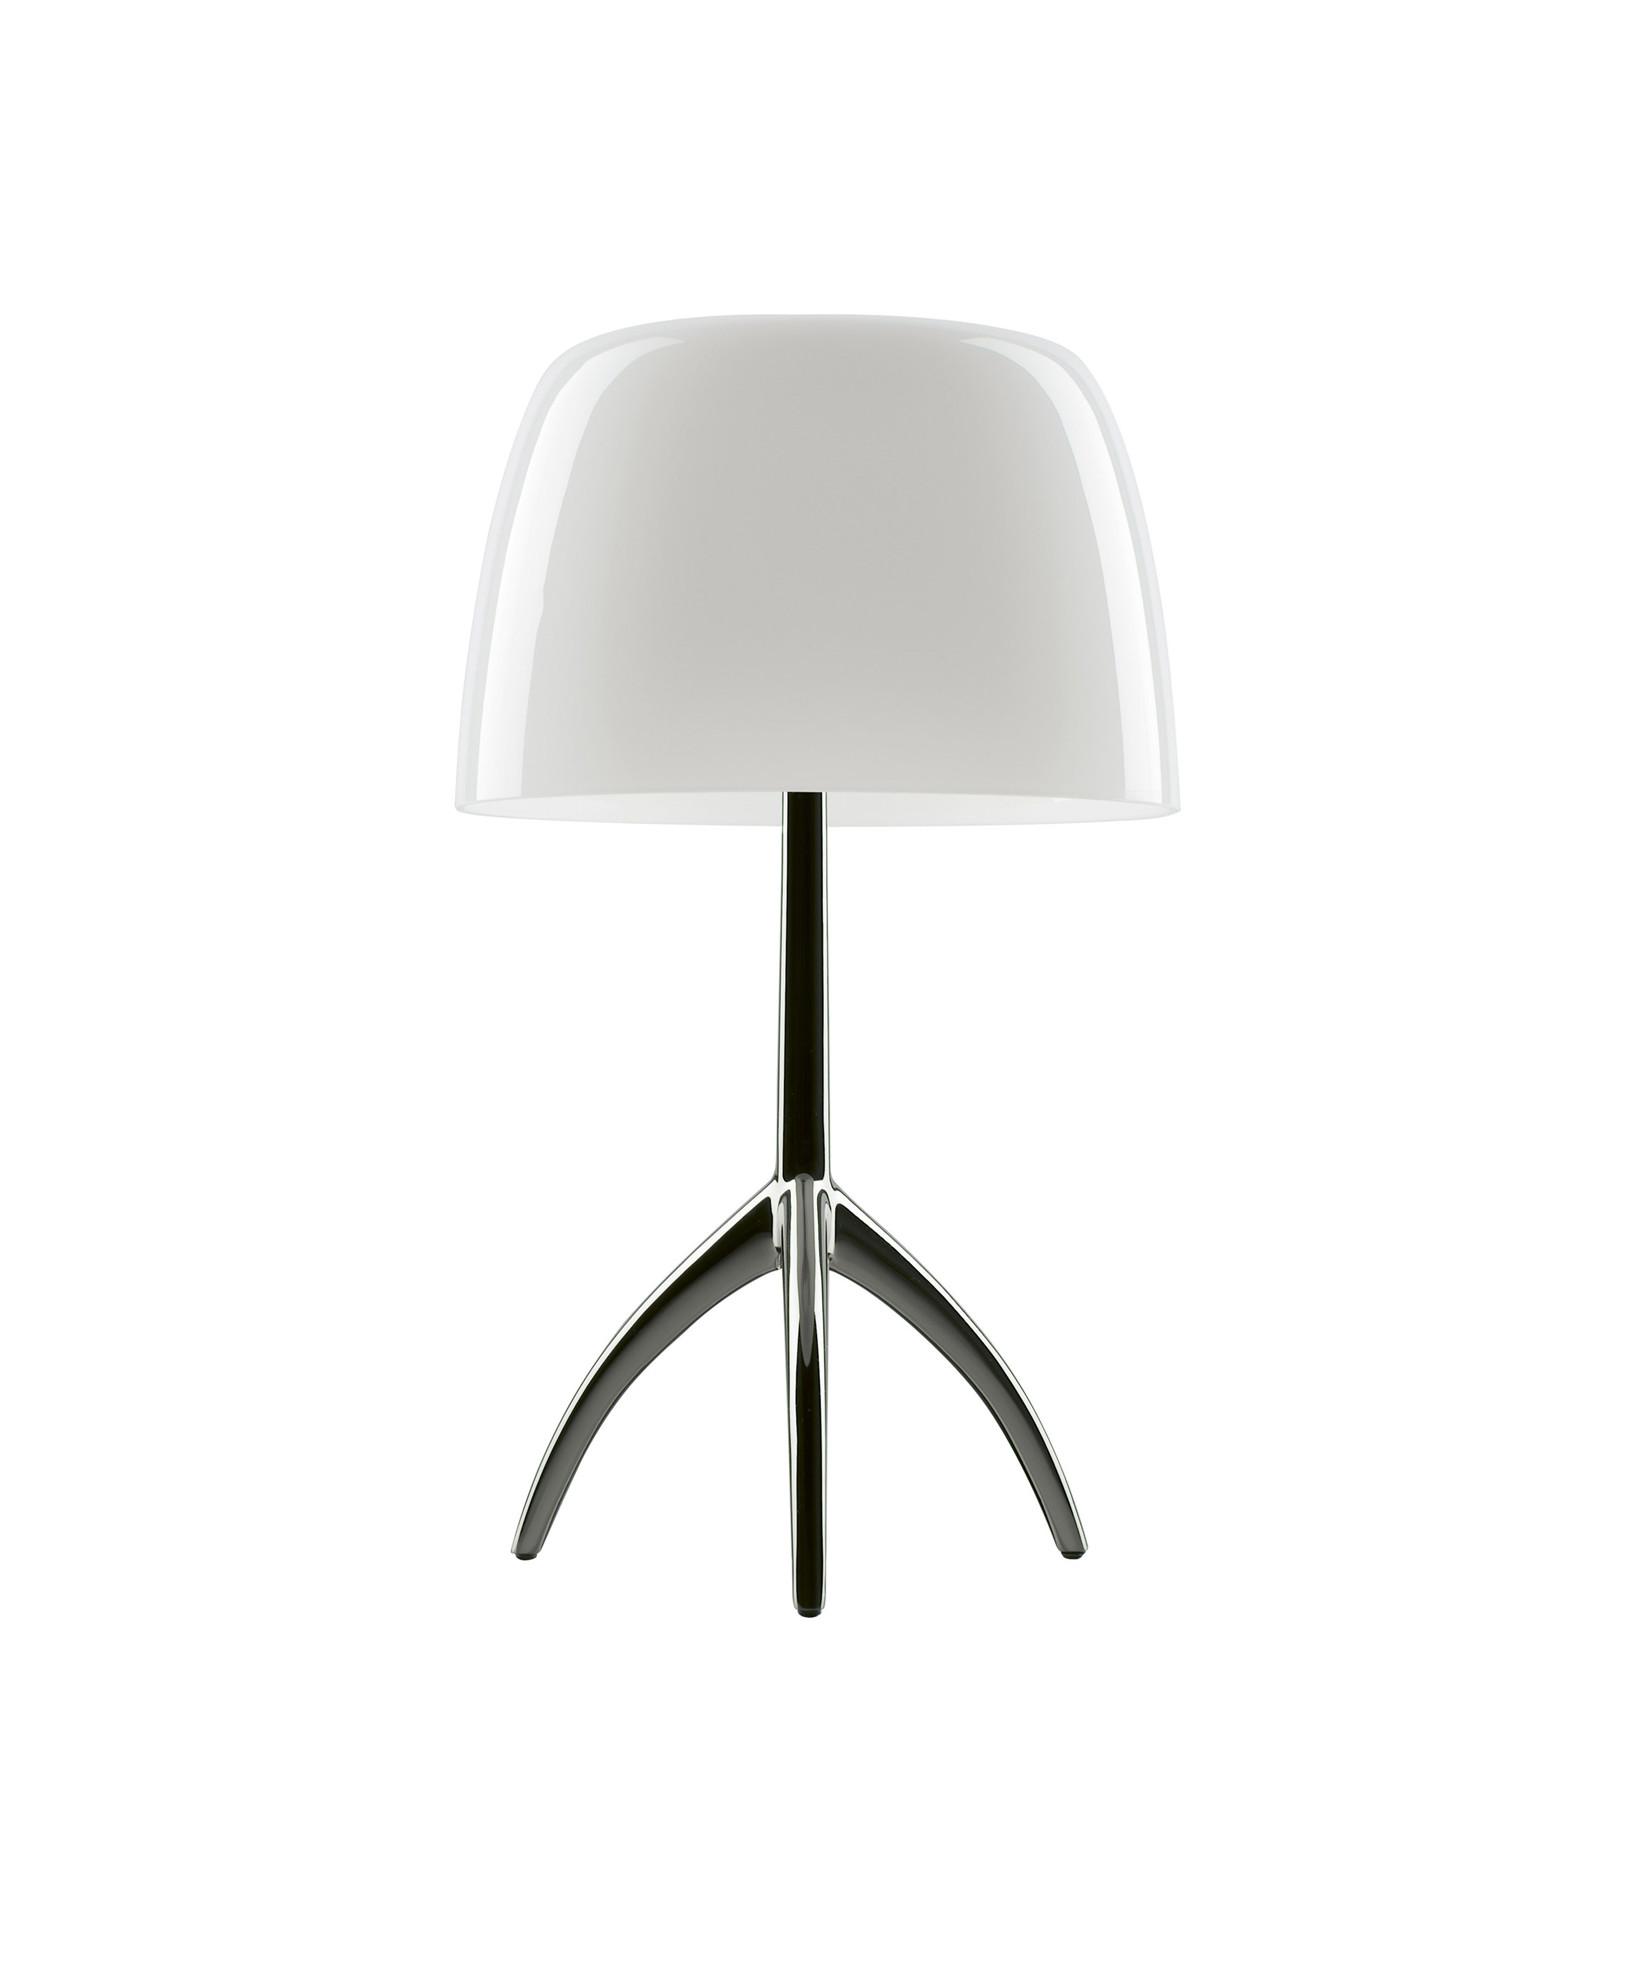 Image of   Lumiere Grande Bordlampe Alu/Hvid - Foscarini